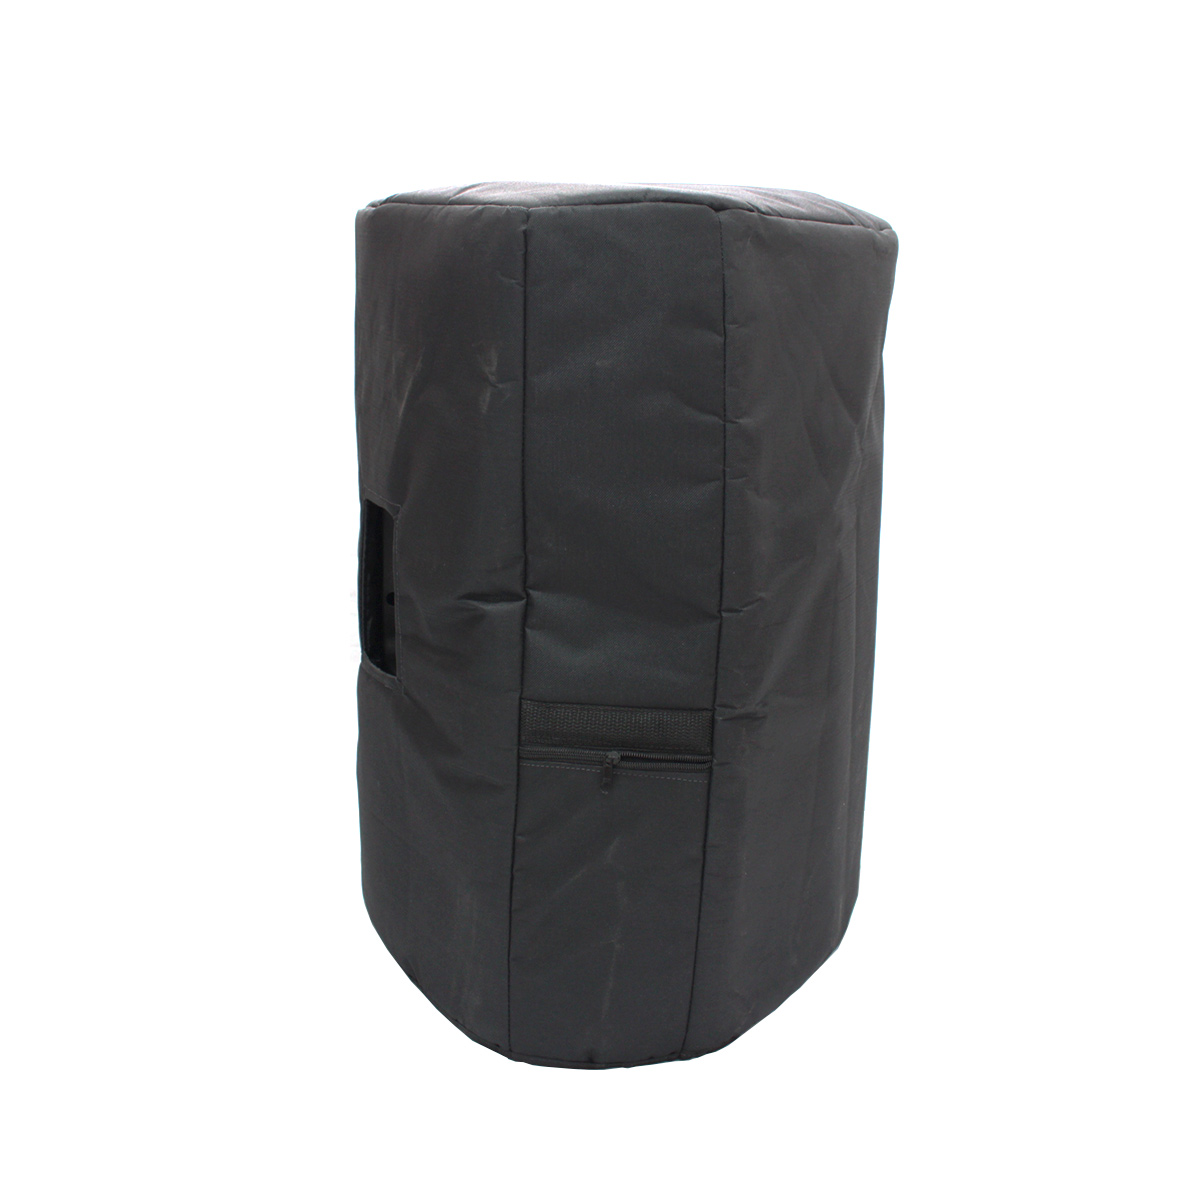 Capa de Prote��o p/ a Caixa CSR 3000 - VR